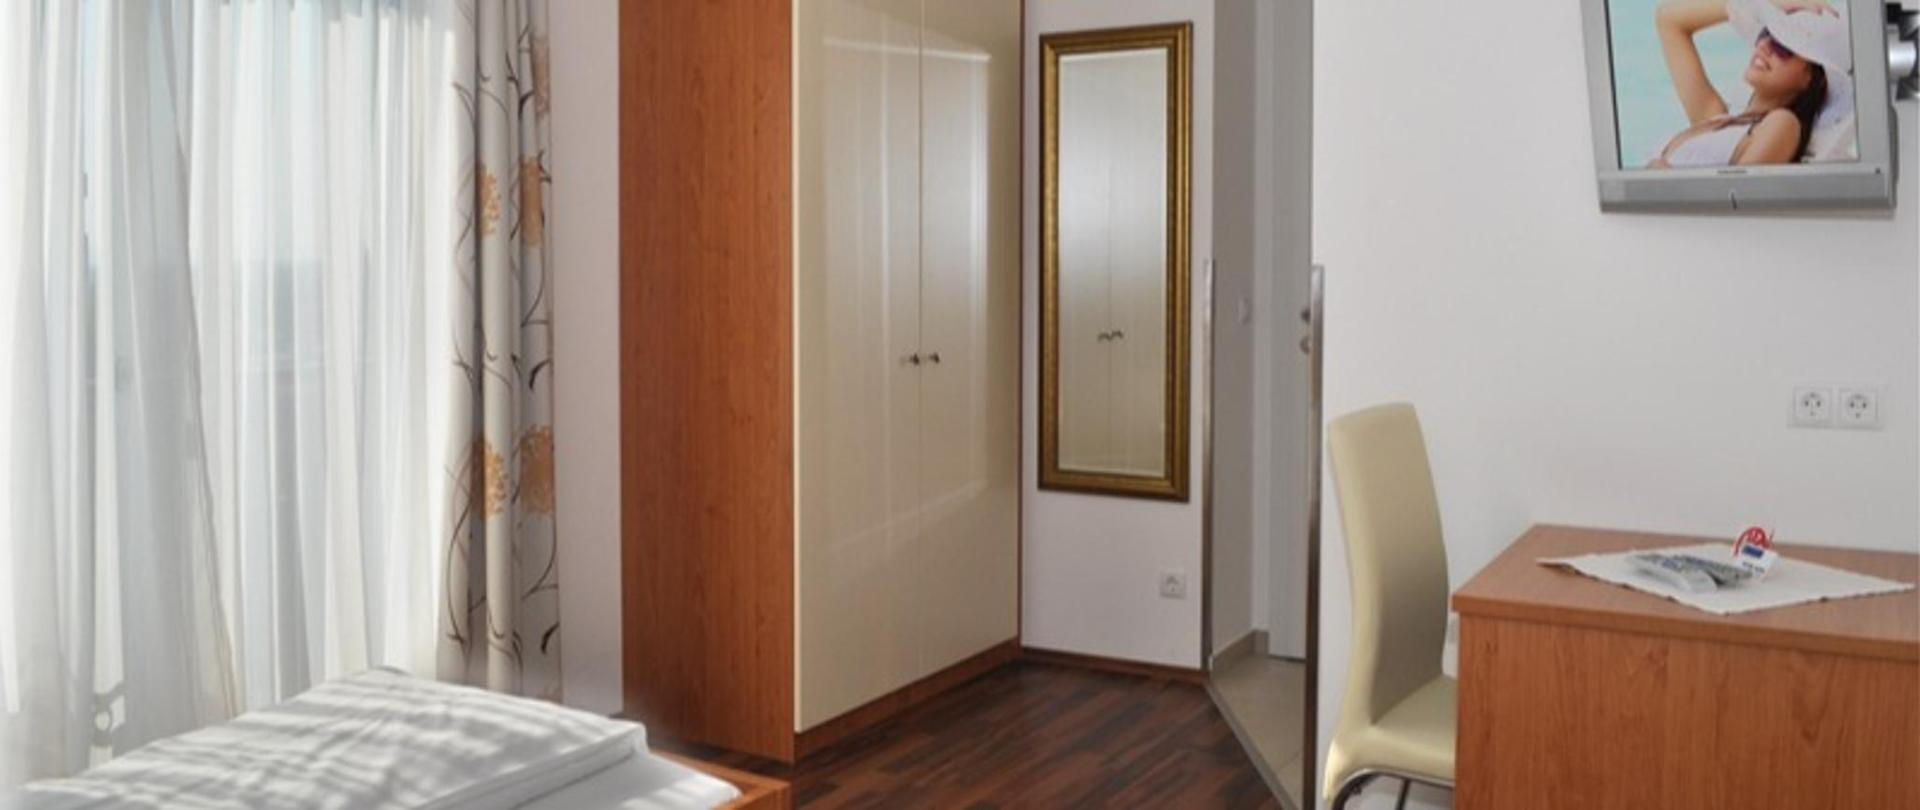 Zimmer 2_126_72dpi.jpg